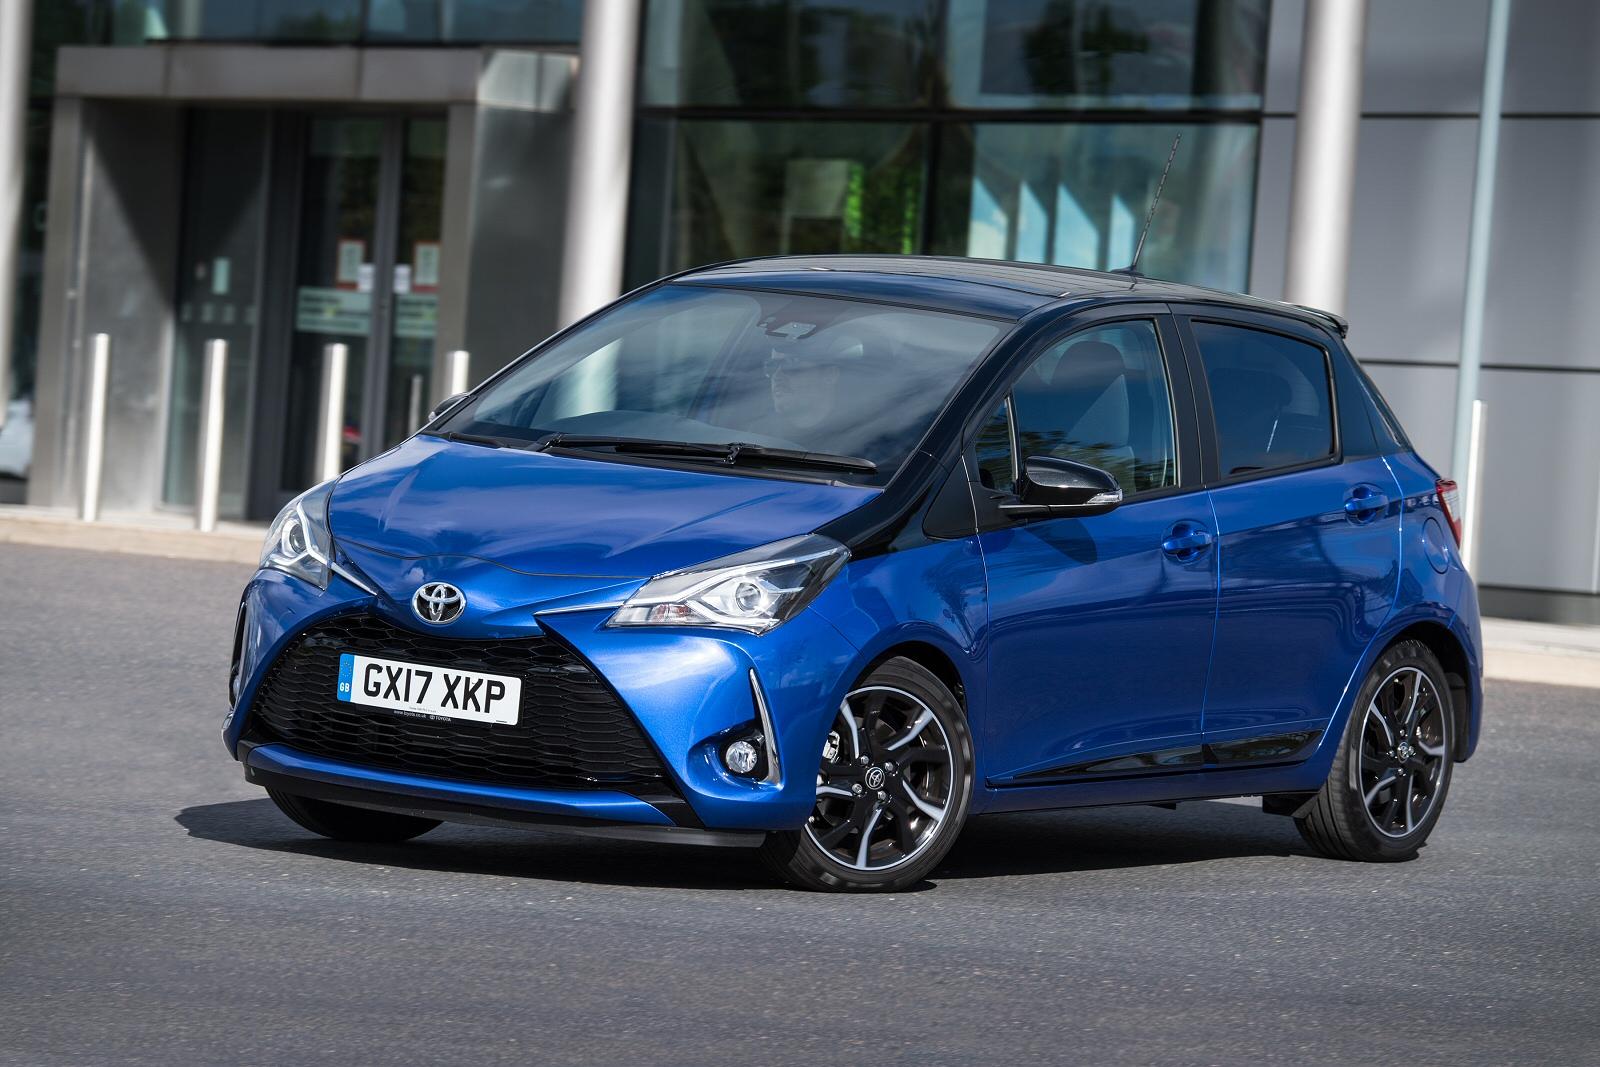 716721263d New Toyota Yaris 1.5 VVT-i Blue Bi-tone 5dr Petrol Hatchback for ...